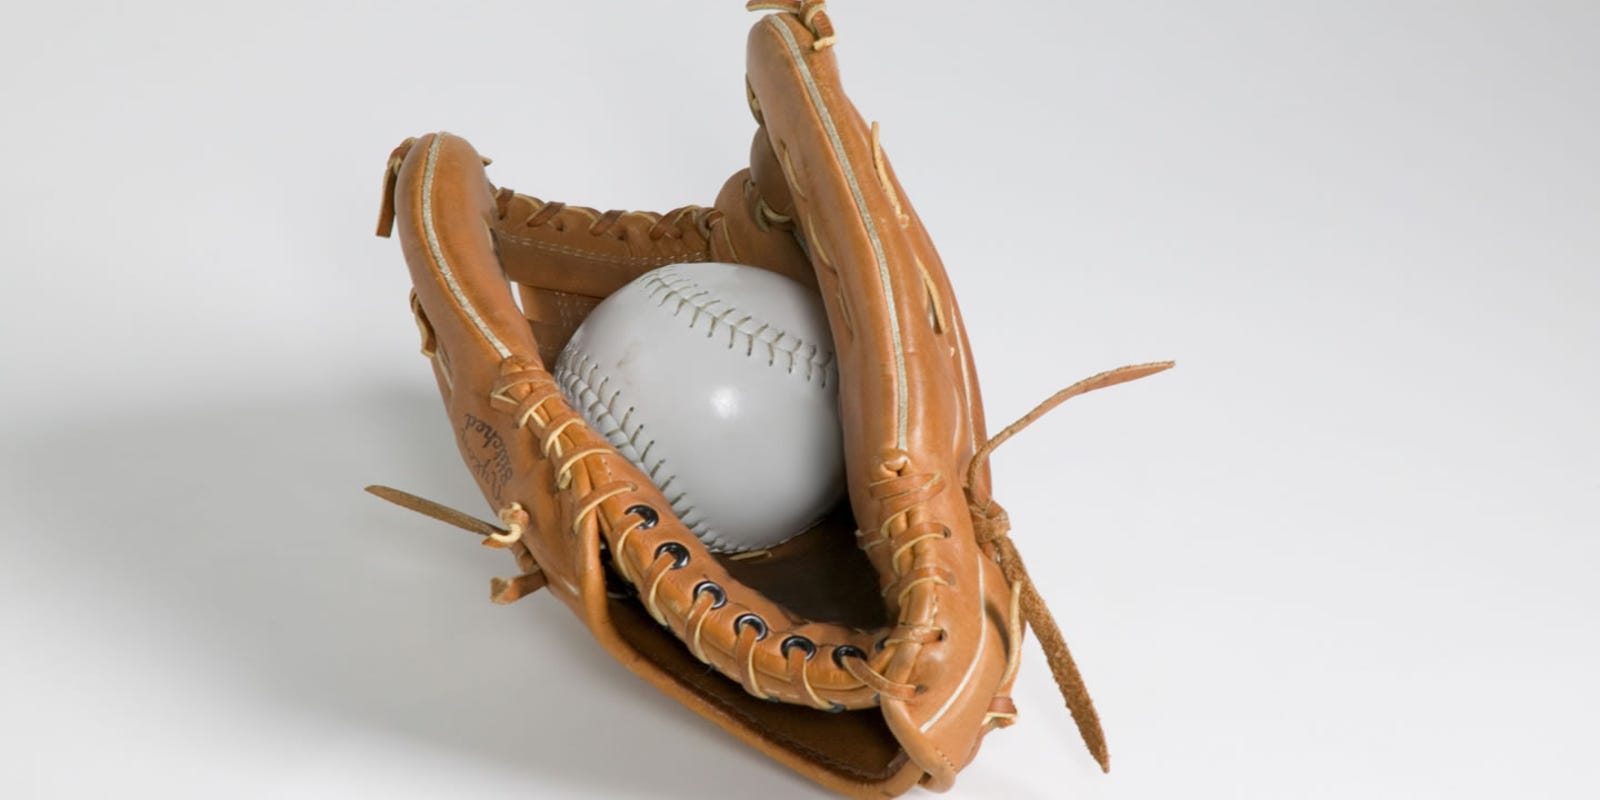 Johnston softball player wins Home Run Derby at Little League World Series